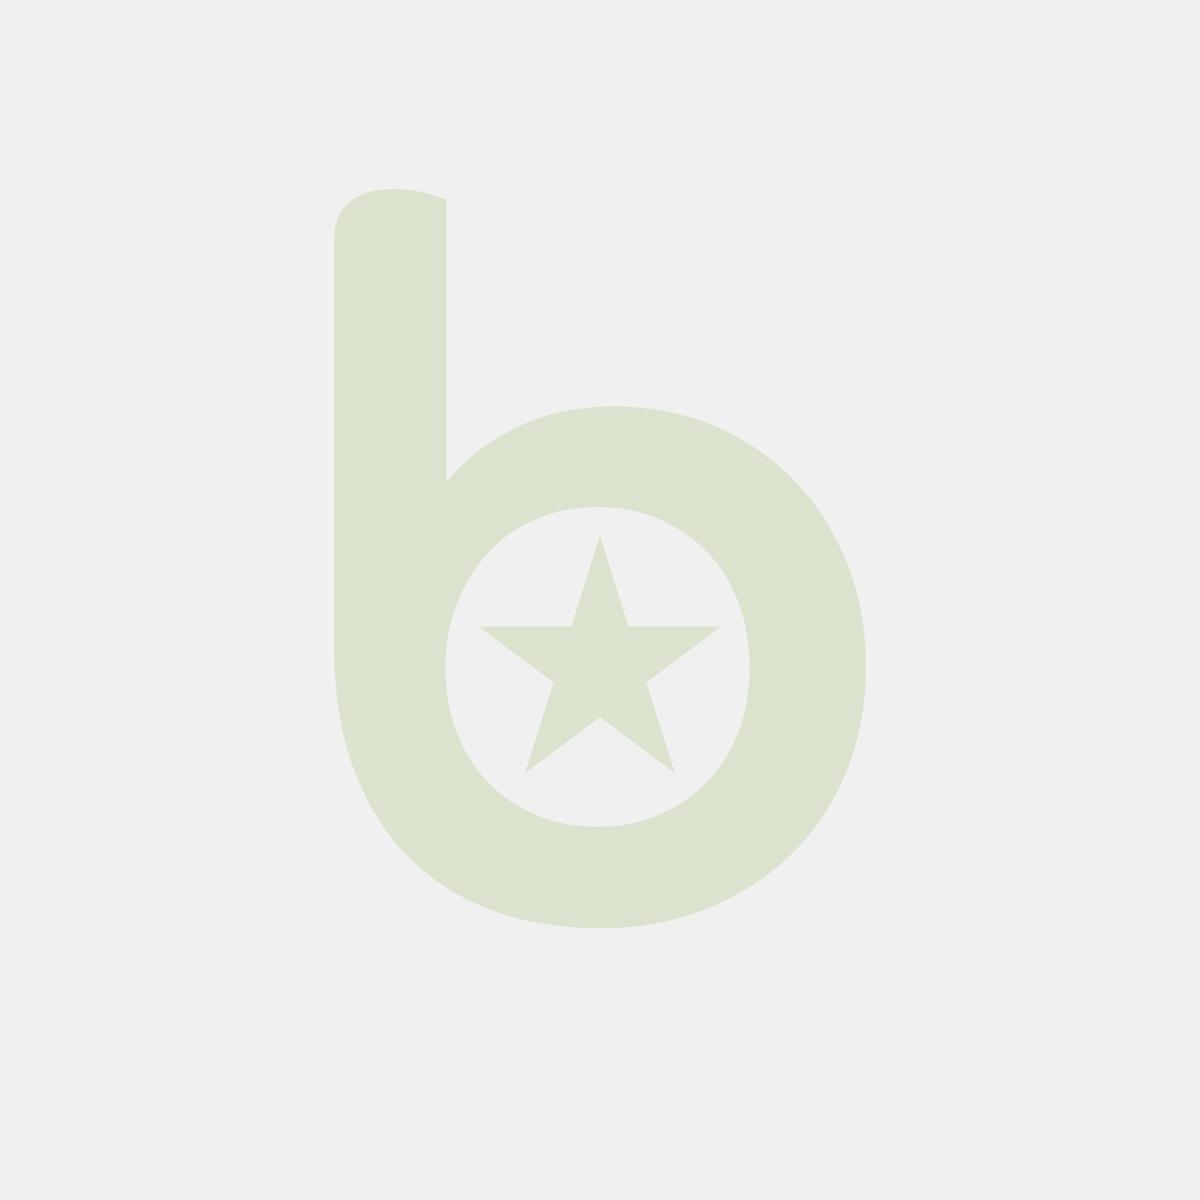 Sznurek polerowany, Jumatex, 2,5dkg